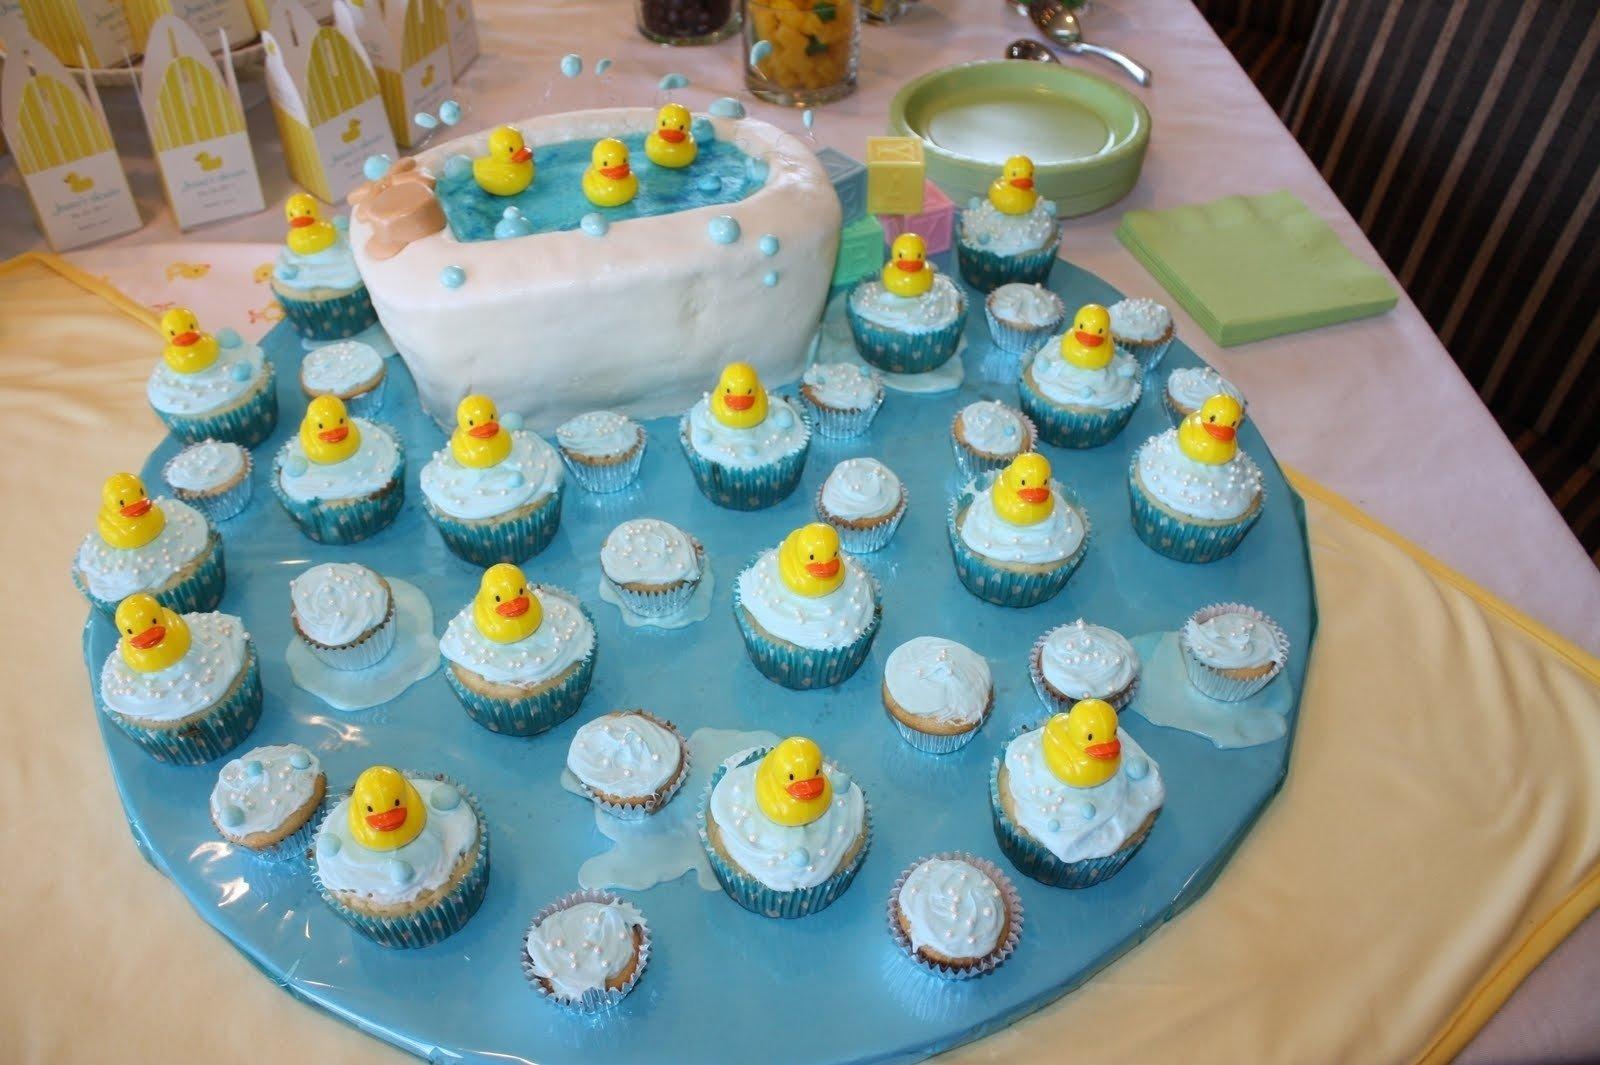 10 Spectacular Baby Shower Cake Decorating Ideas 70 ba shower cakes and cupcakes ideas regarding baby shower 2020